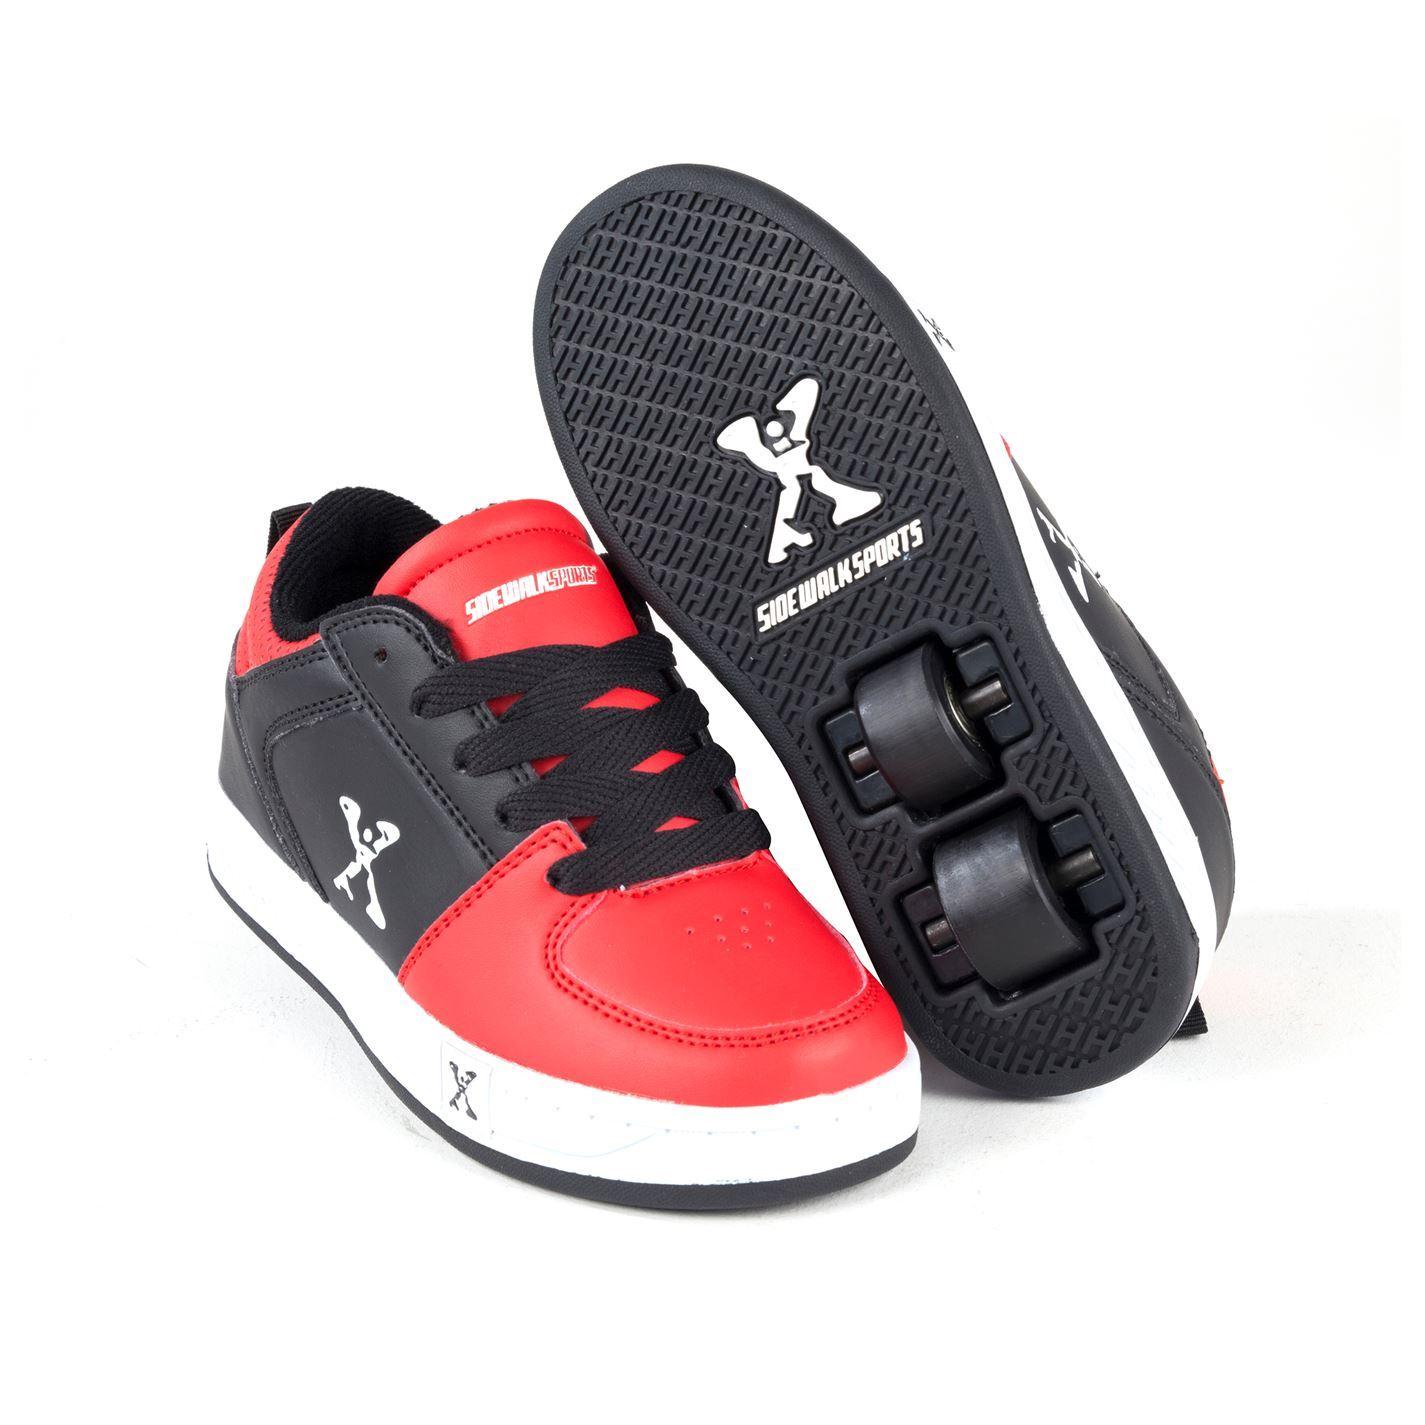 Sidewalk sport lane roller skate shoes - Sidewalk Sport Kids Street Boys Lace Up Skate